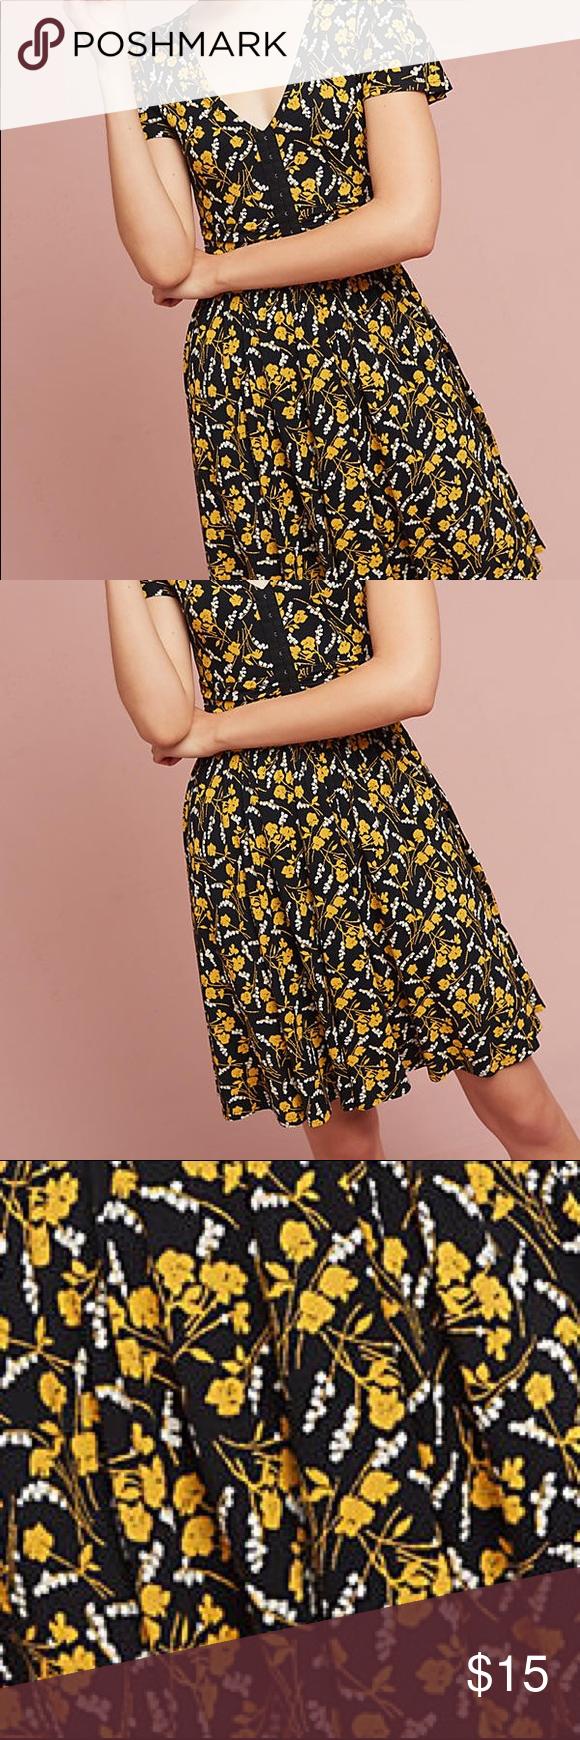 Black Yellow Dress Anthropologie Dress Dresses Yellow Dress [ 1740 x 580 Pixel ]